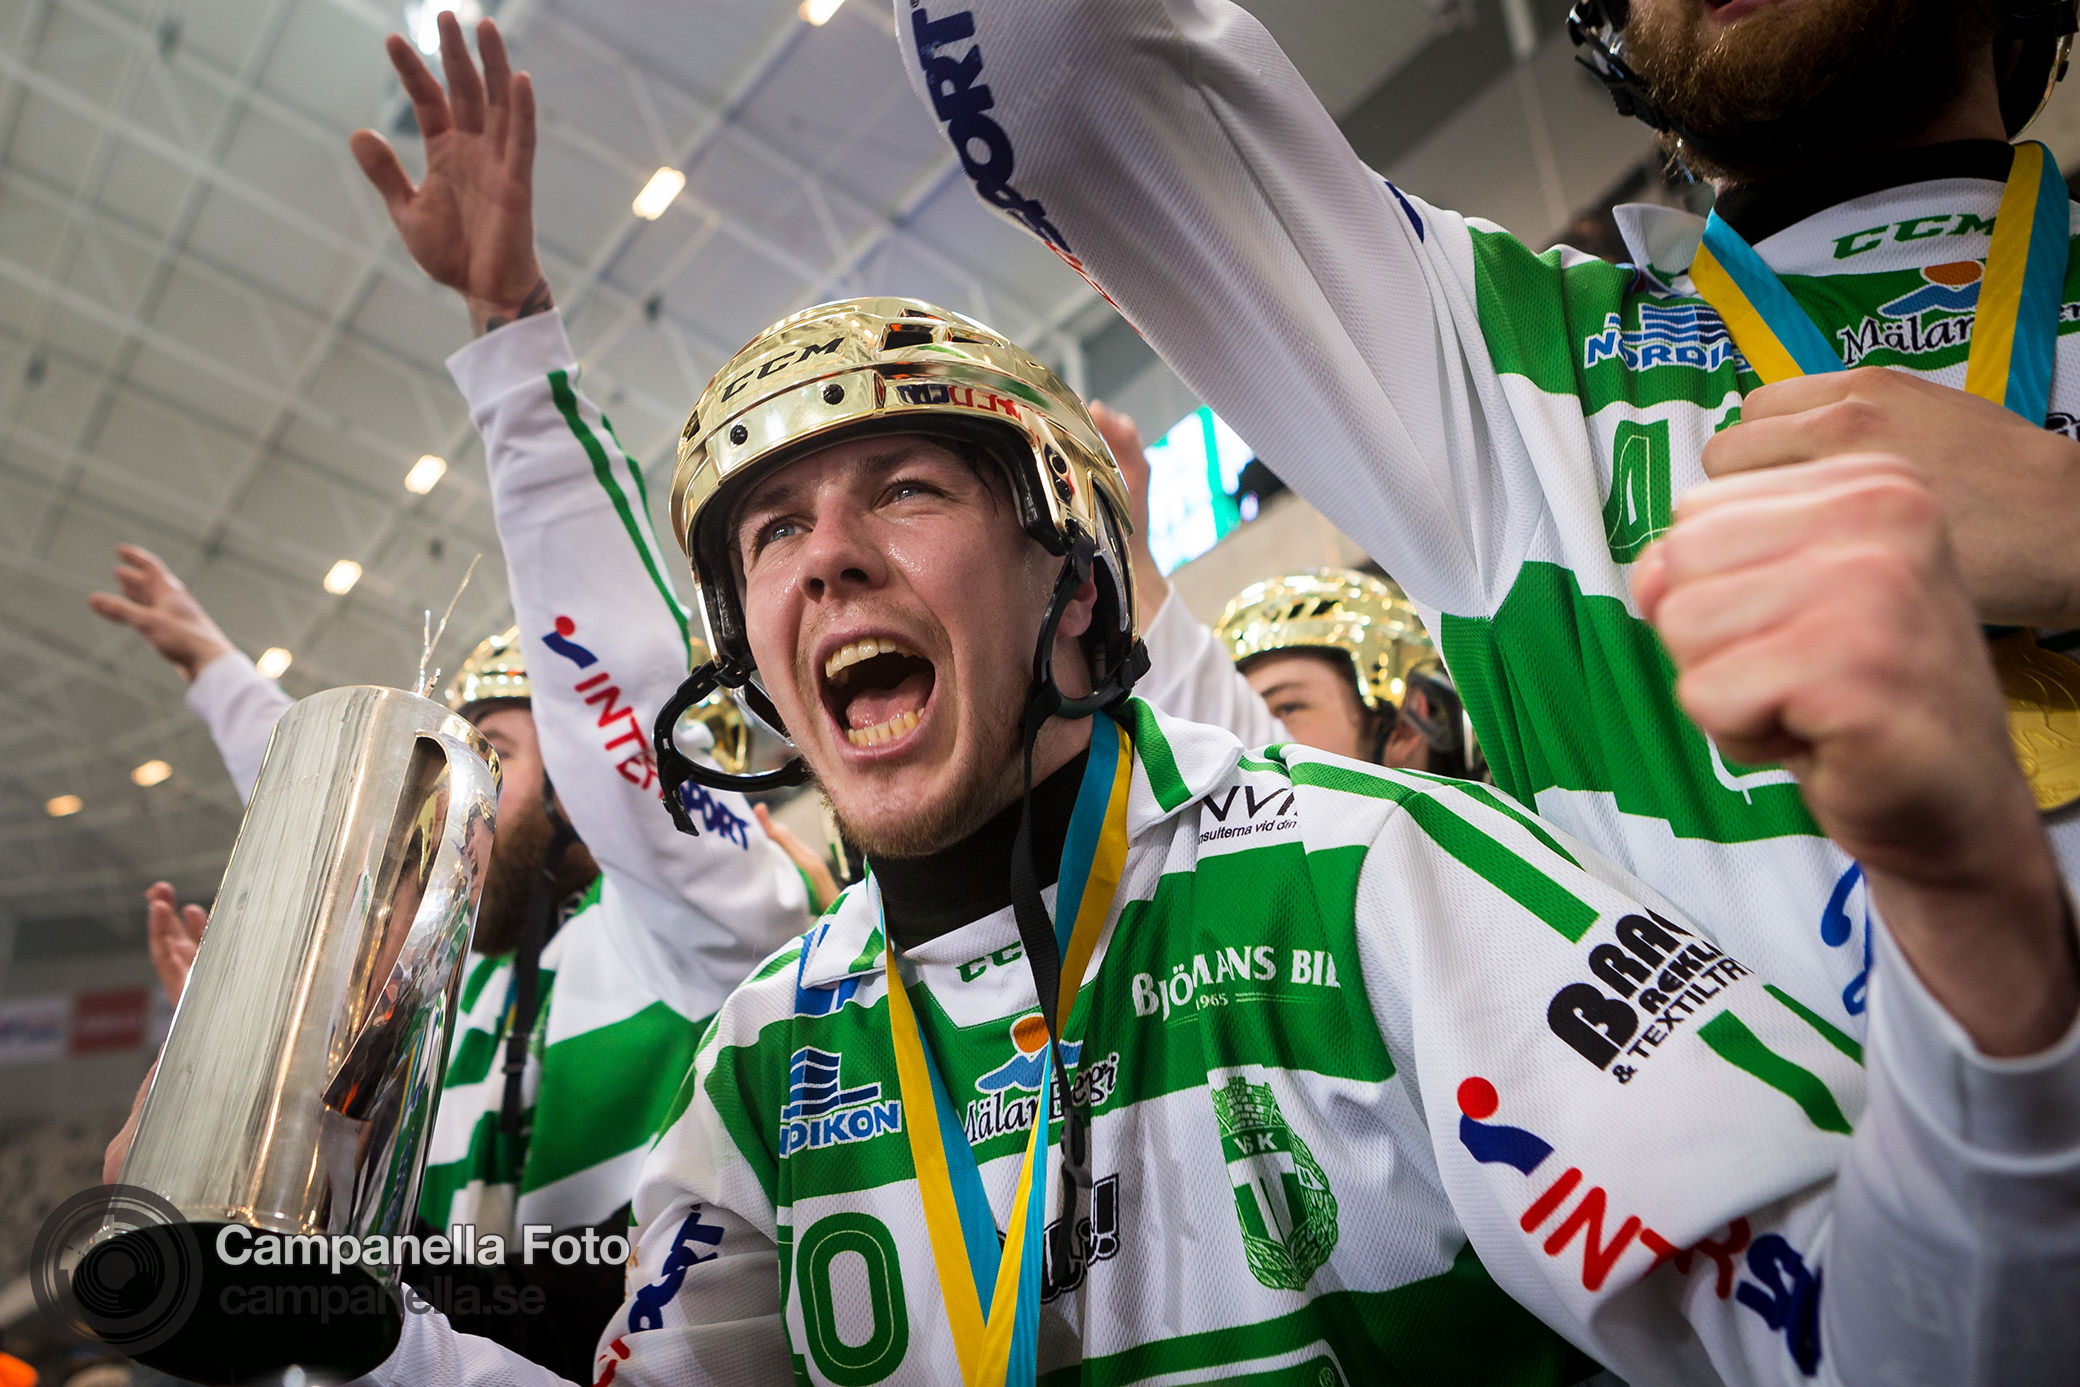 The 2016 Swedish Bandy Final - Michael Campanella Photography